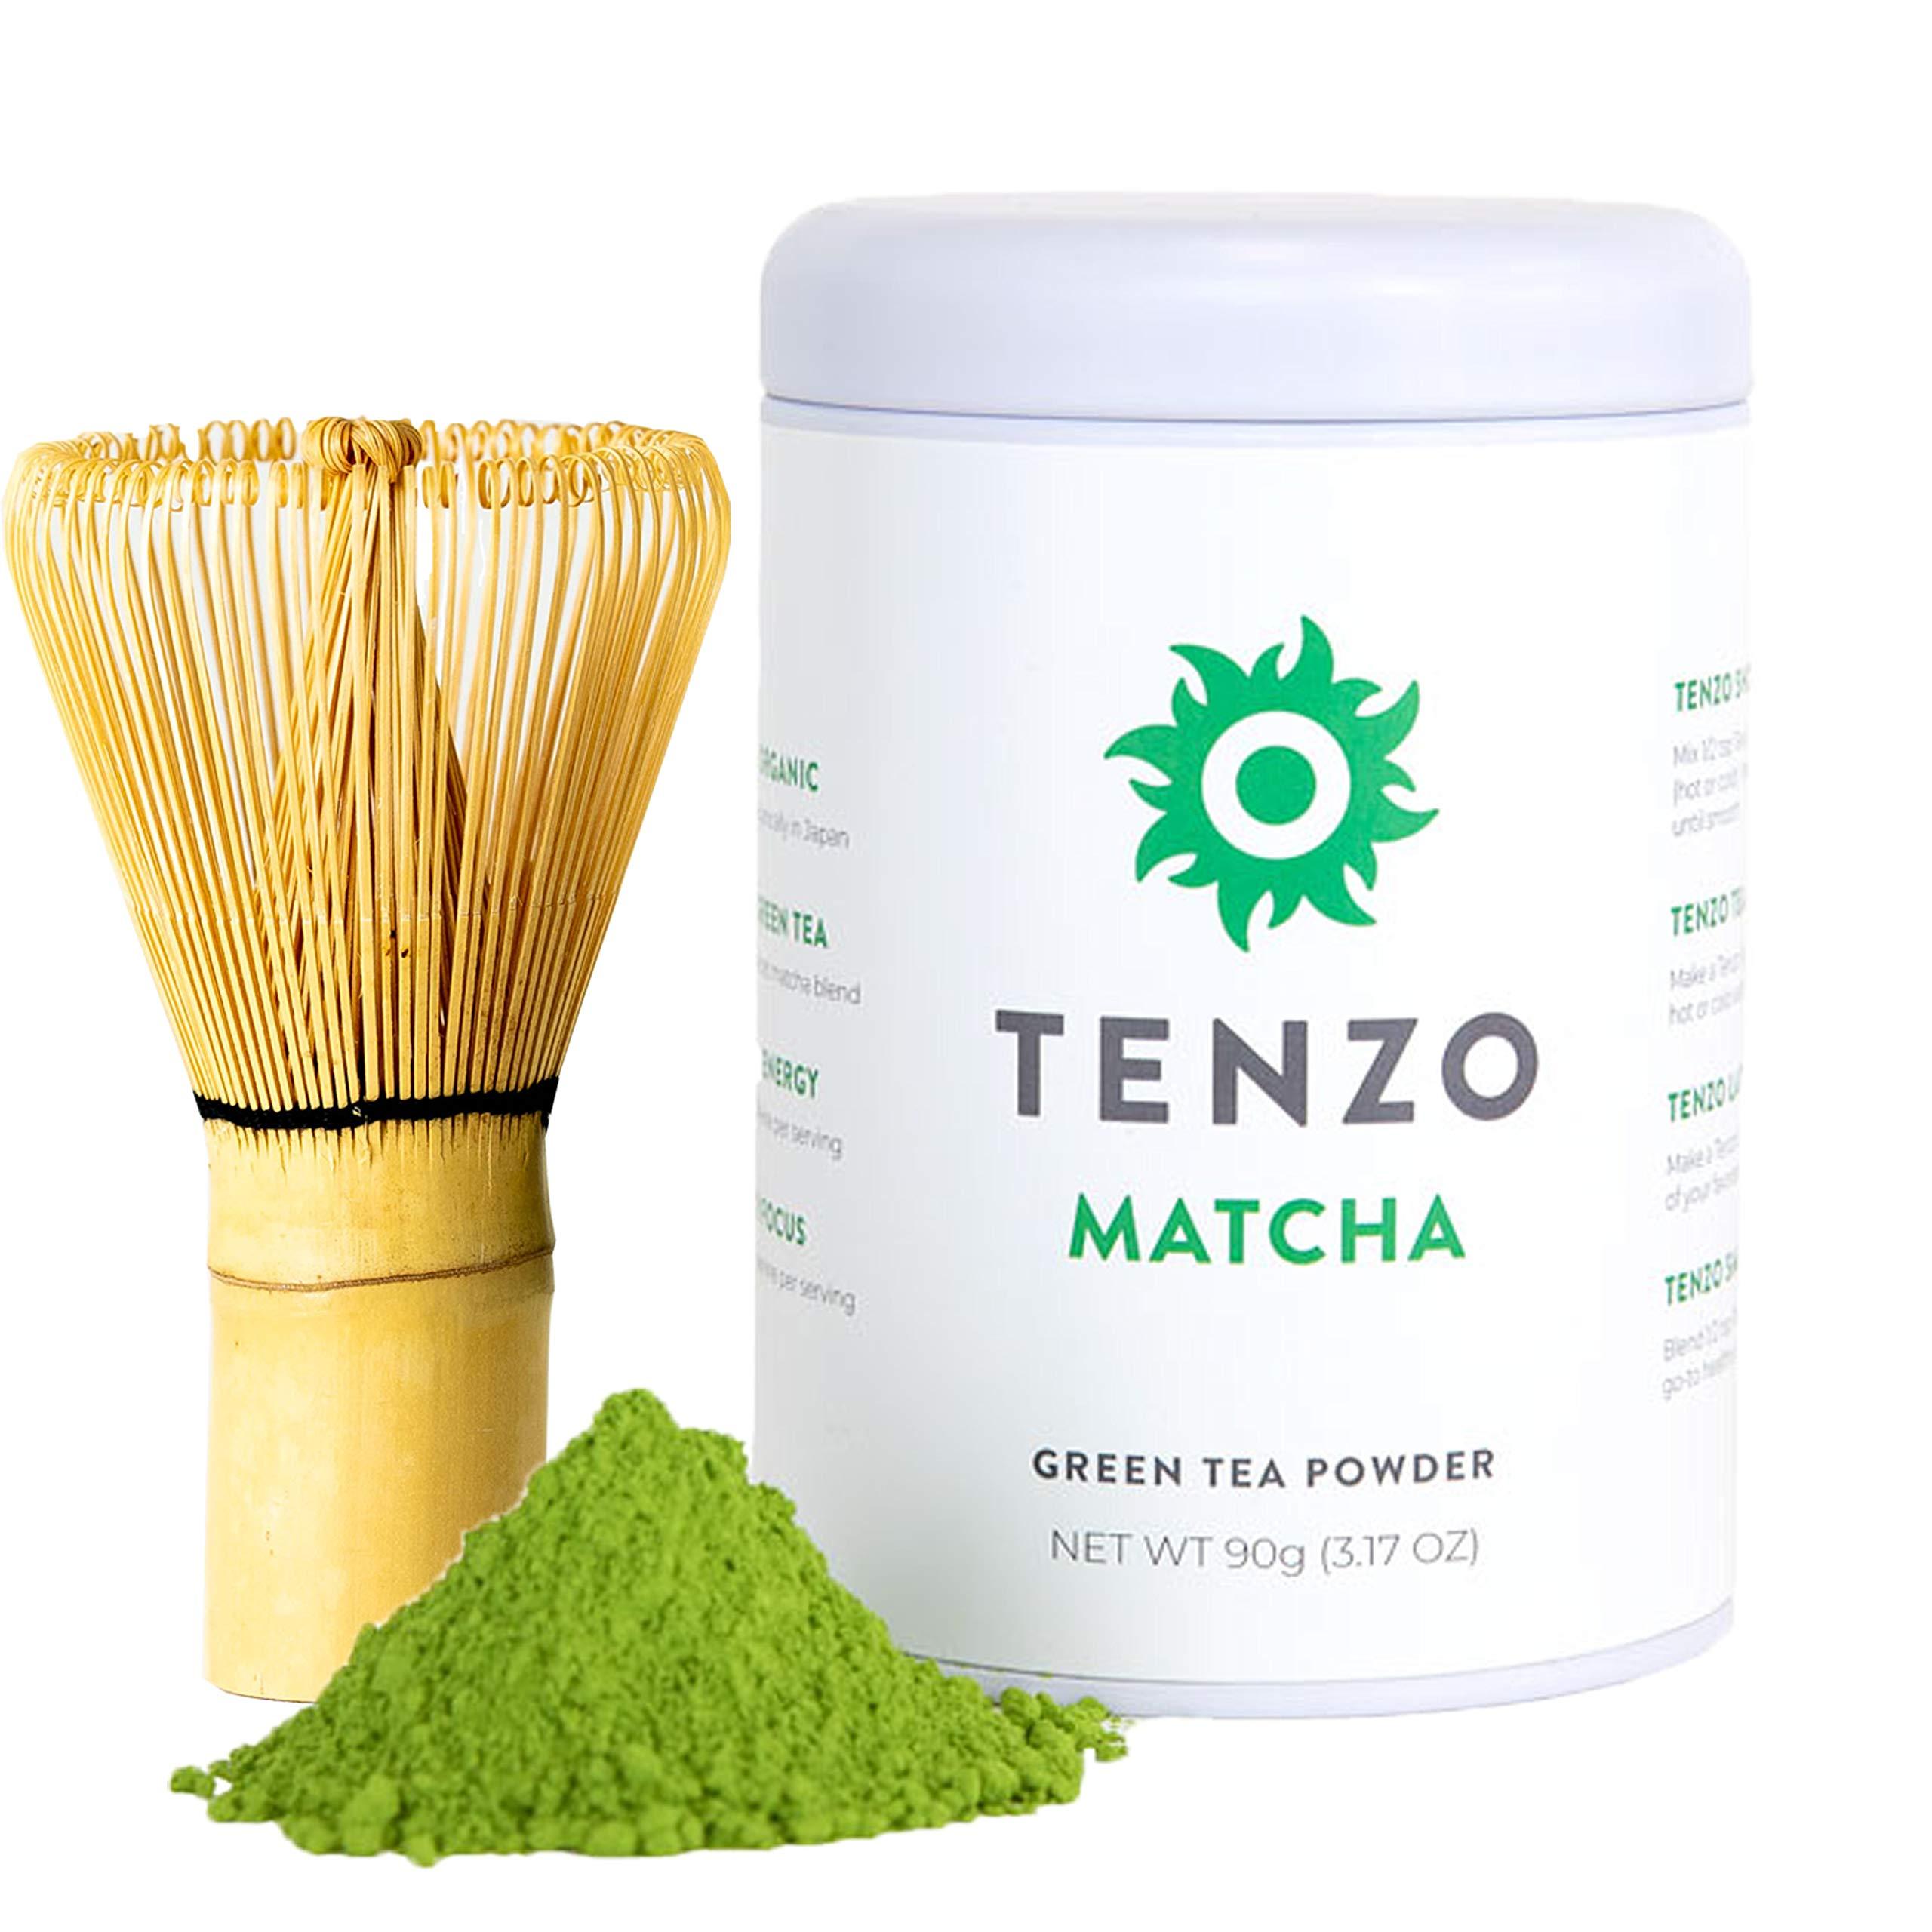 Tenzo Tea (Whisk Included in Box) - Ceremonial Grade Matcha Green Tea Powder (For Sipping as Tea) - USDA Organic, Kosher, Vegan, Paleo/Keto Friendly (90 Gram + Whisk)